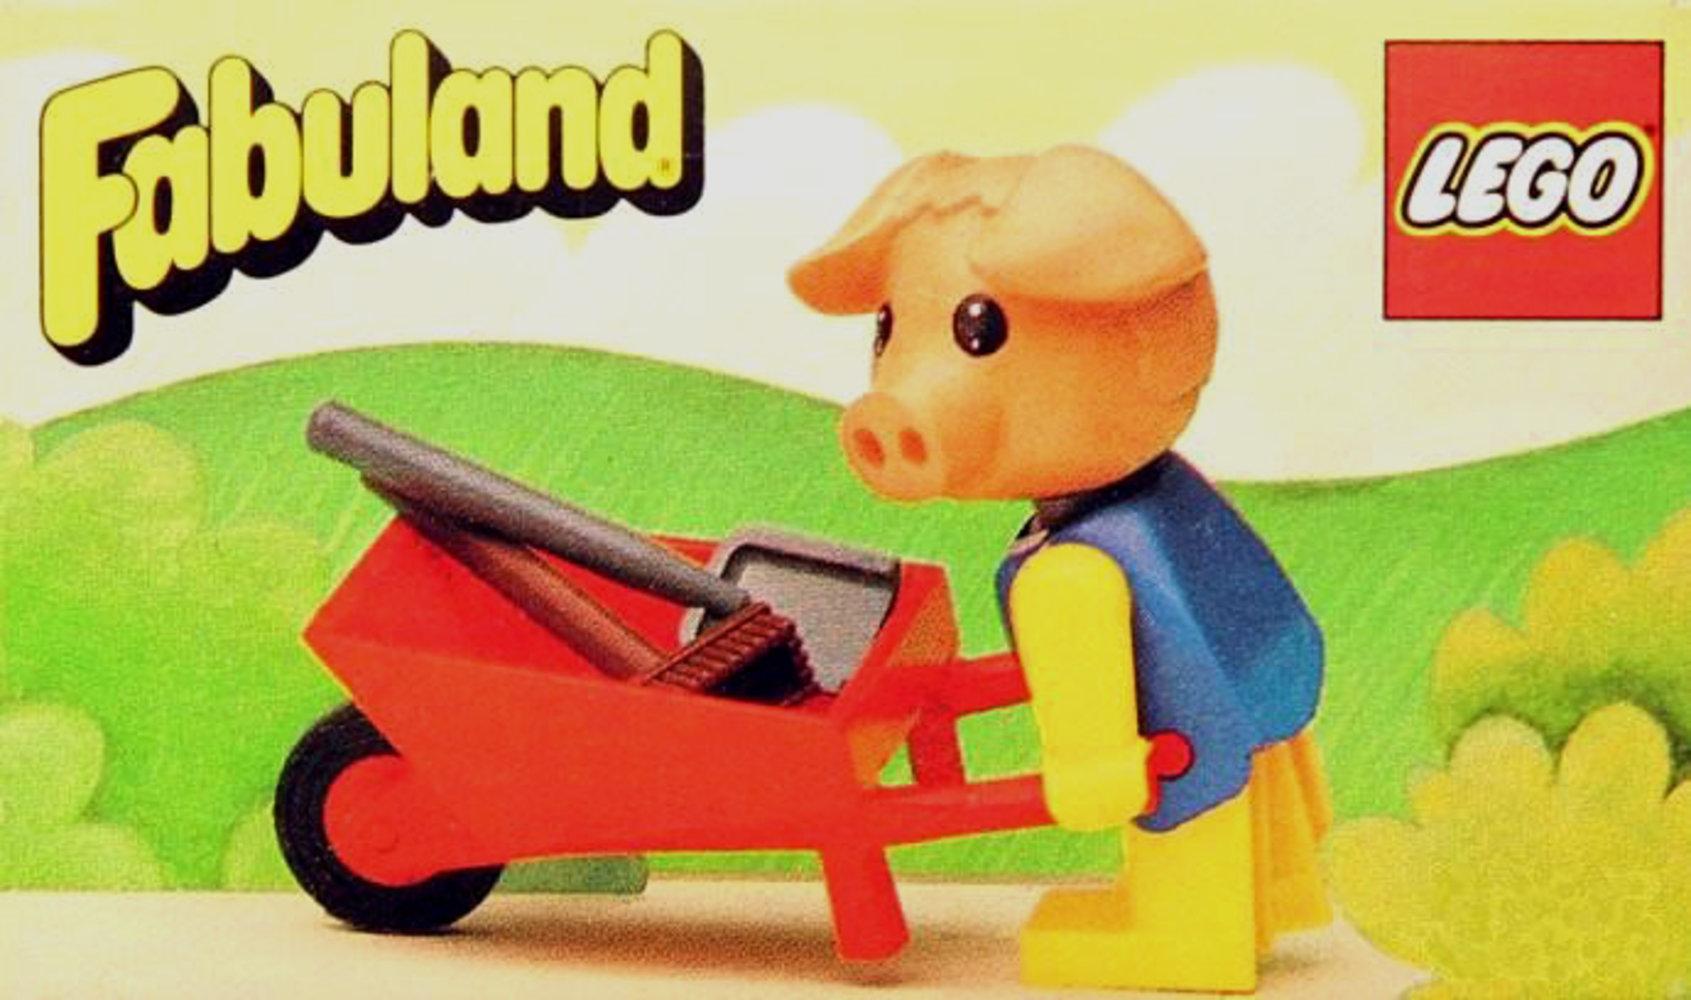 Percy Pig's Wheelbarrow